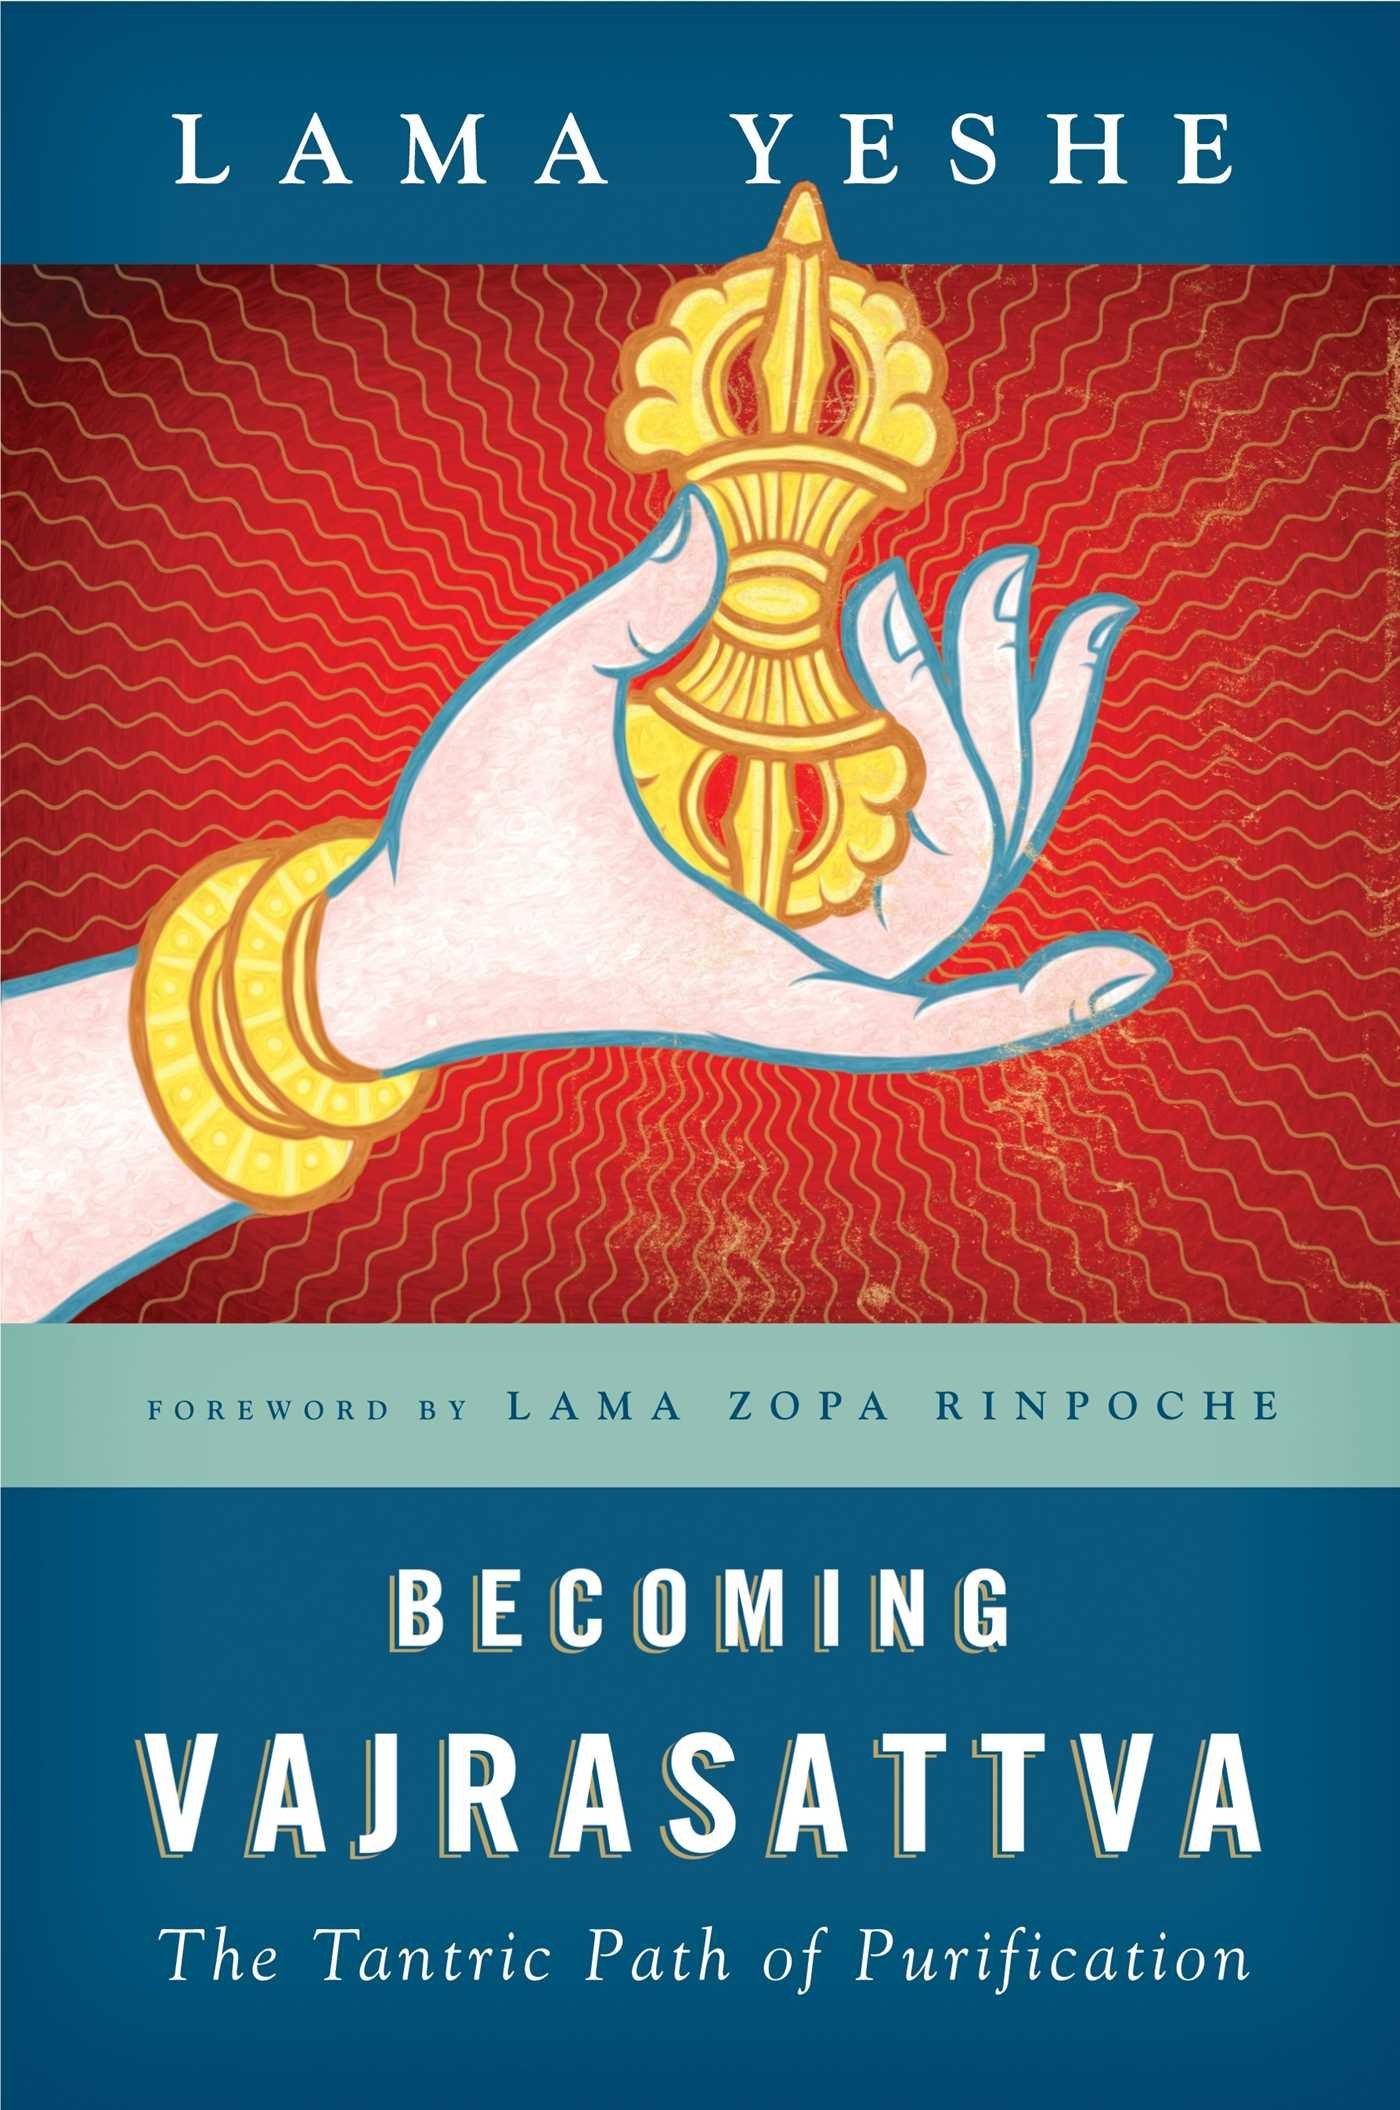 Becoming Vajrasattva: The Tantric Path of Purification: Lama